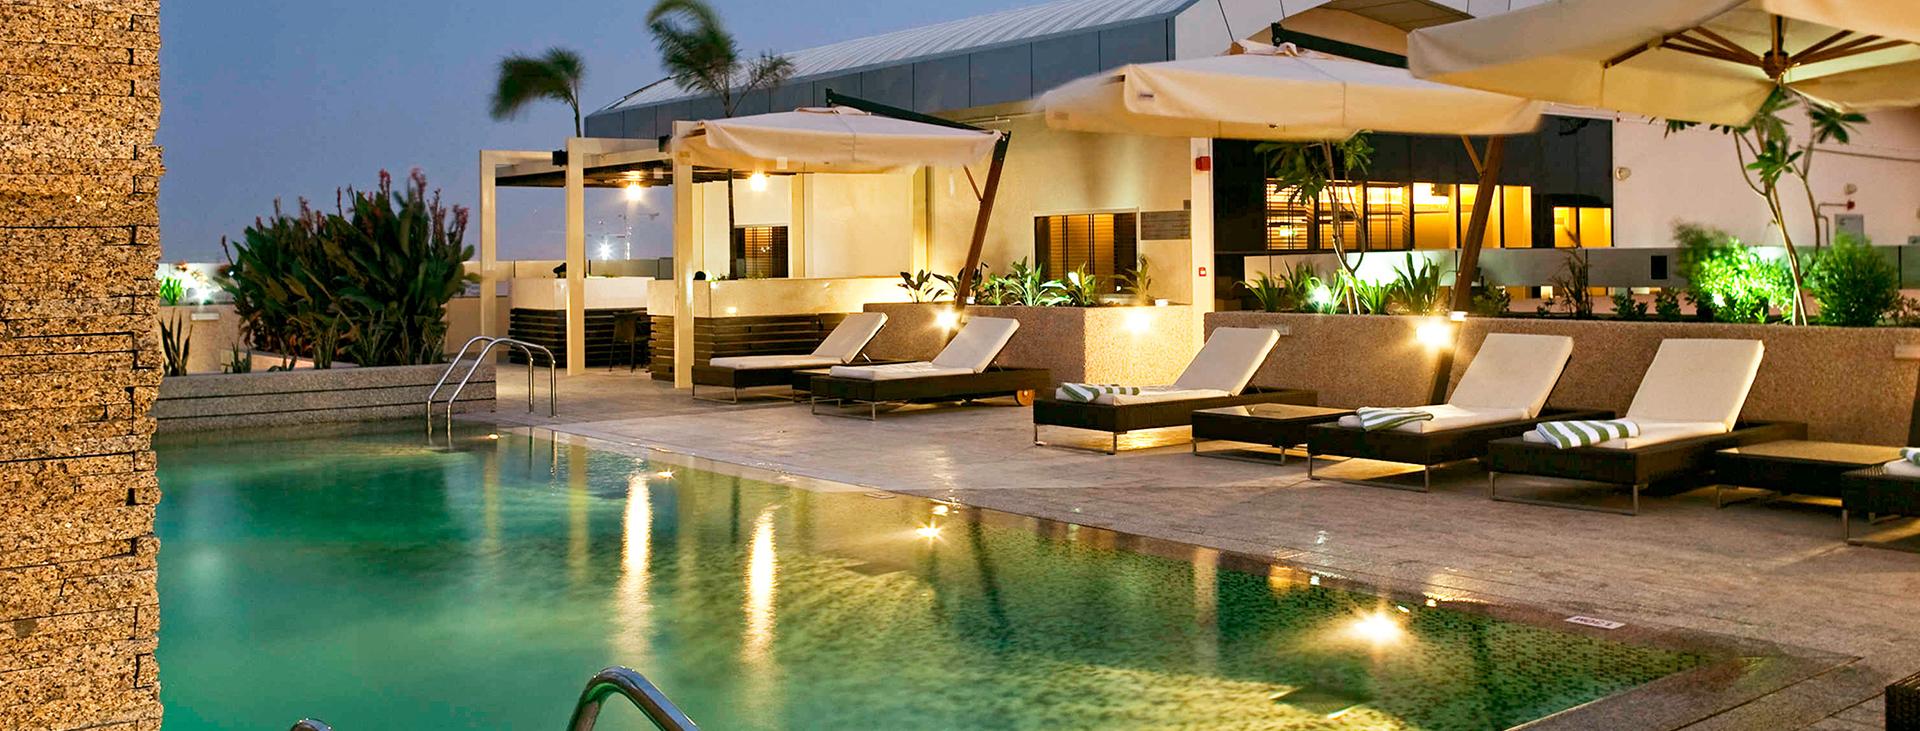 Suite Novotel Mall of the Emirates, Jumeirah Beach, Dubai, Arabiemiraatit